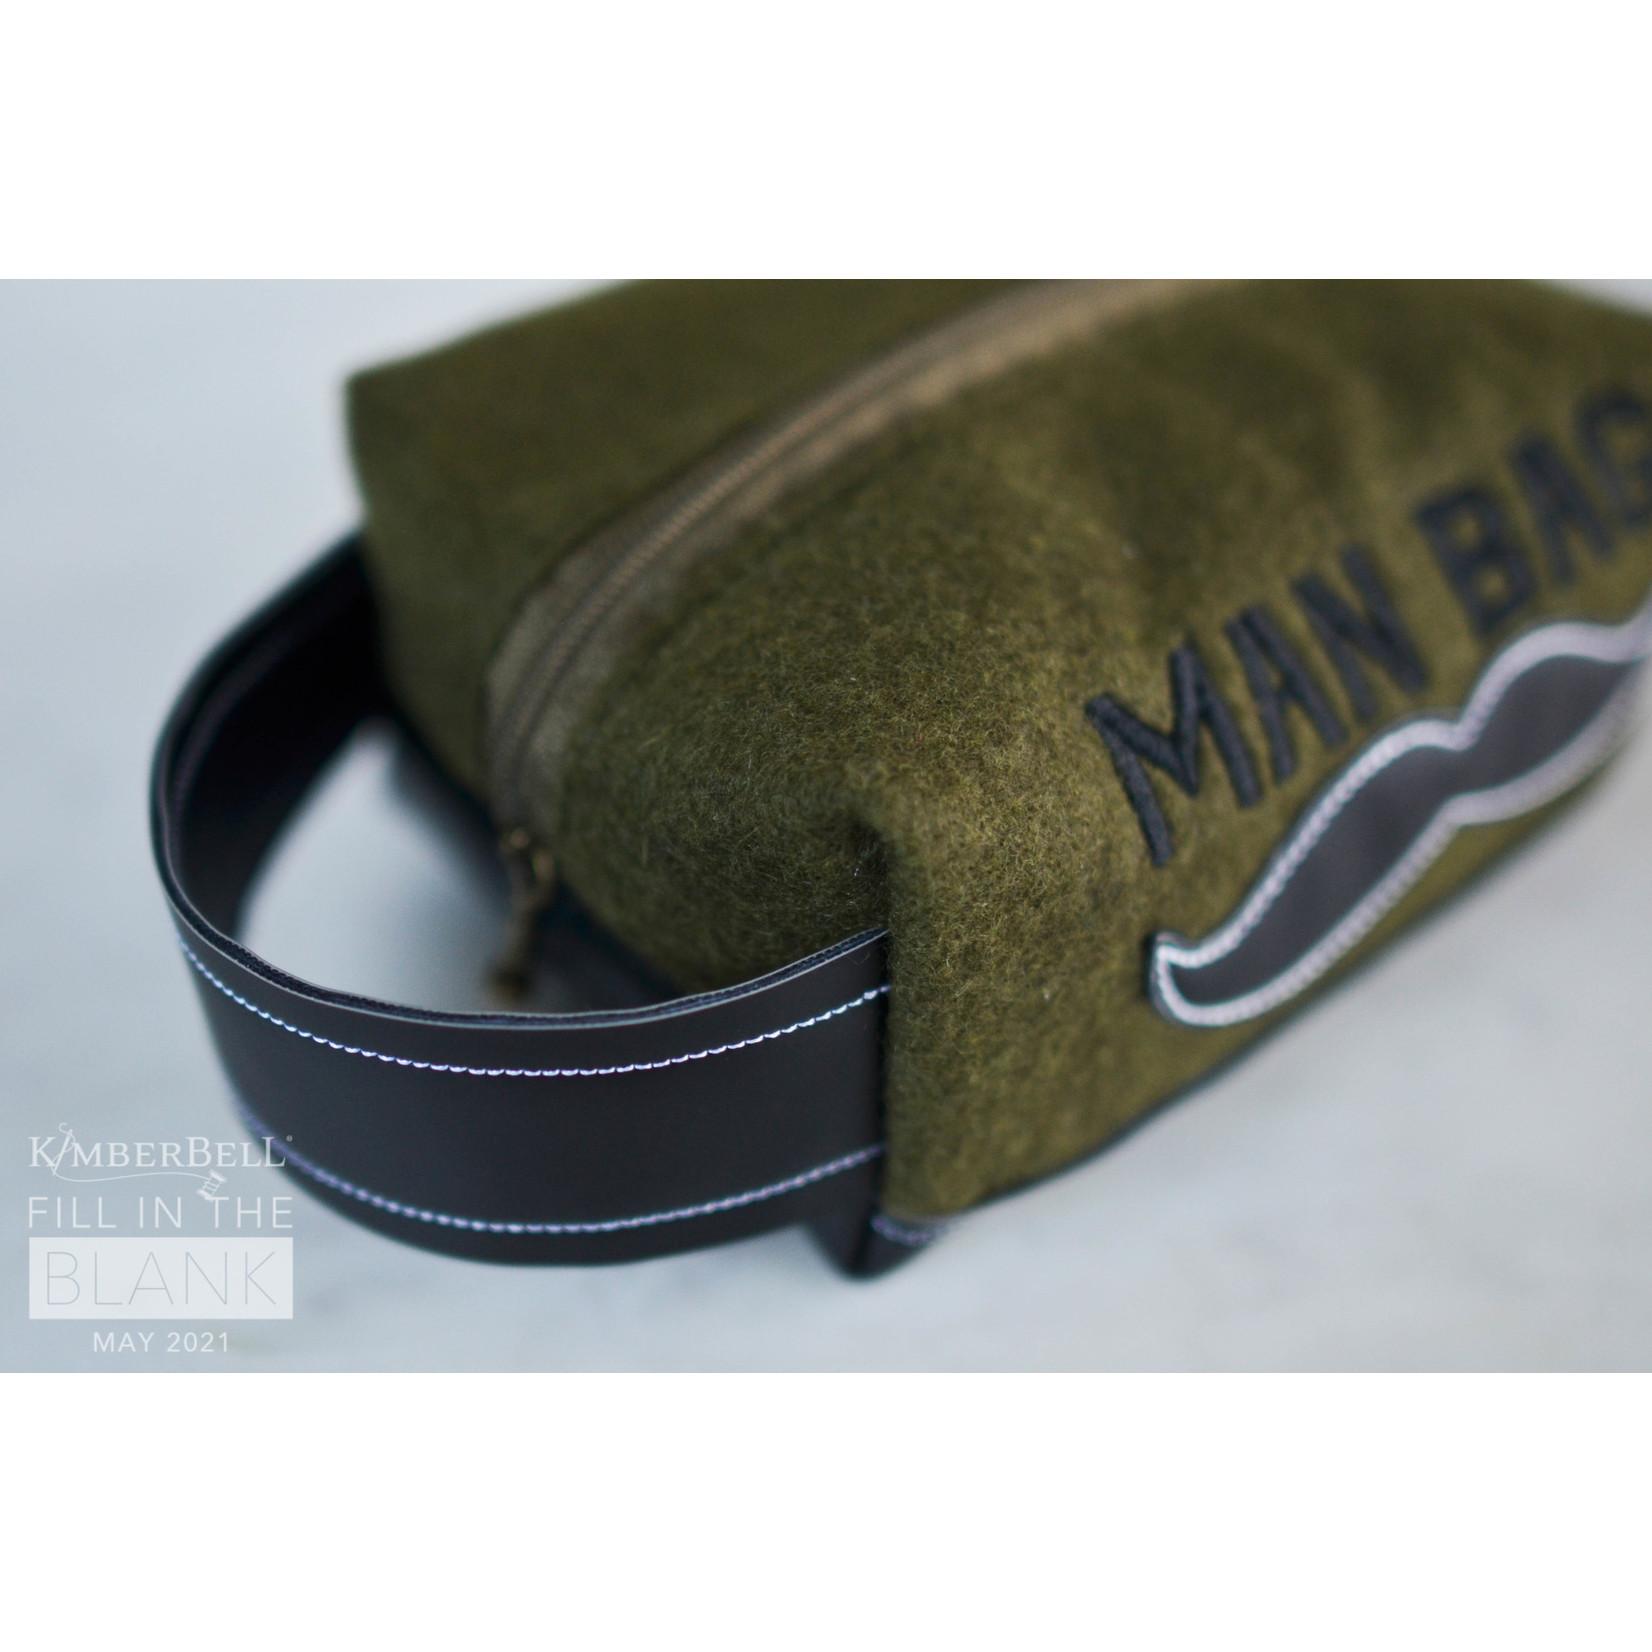 Kimberbell Designs Fill in the Blank - Man Bag Kit